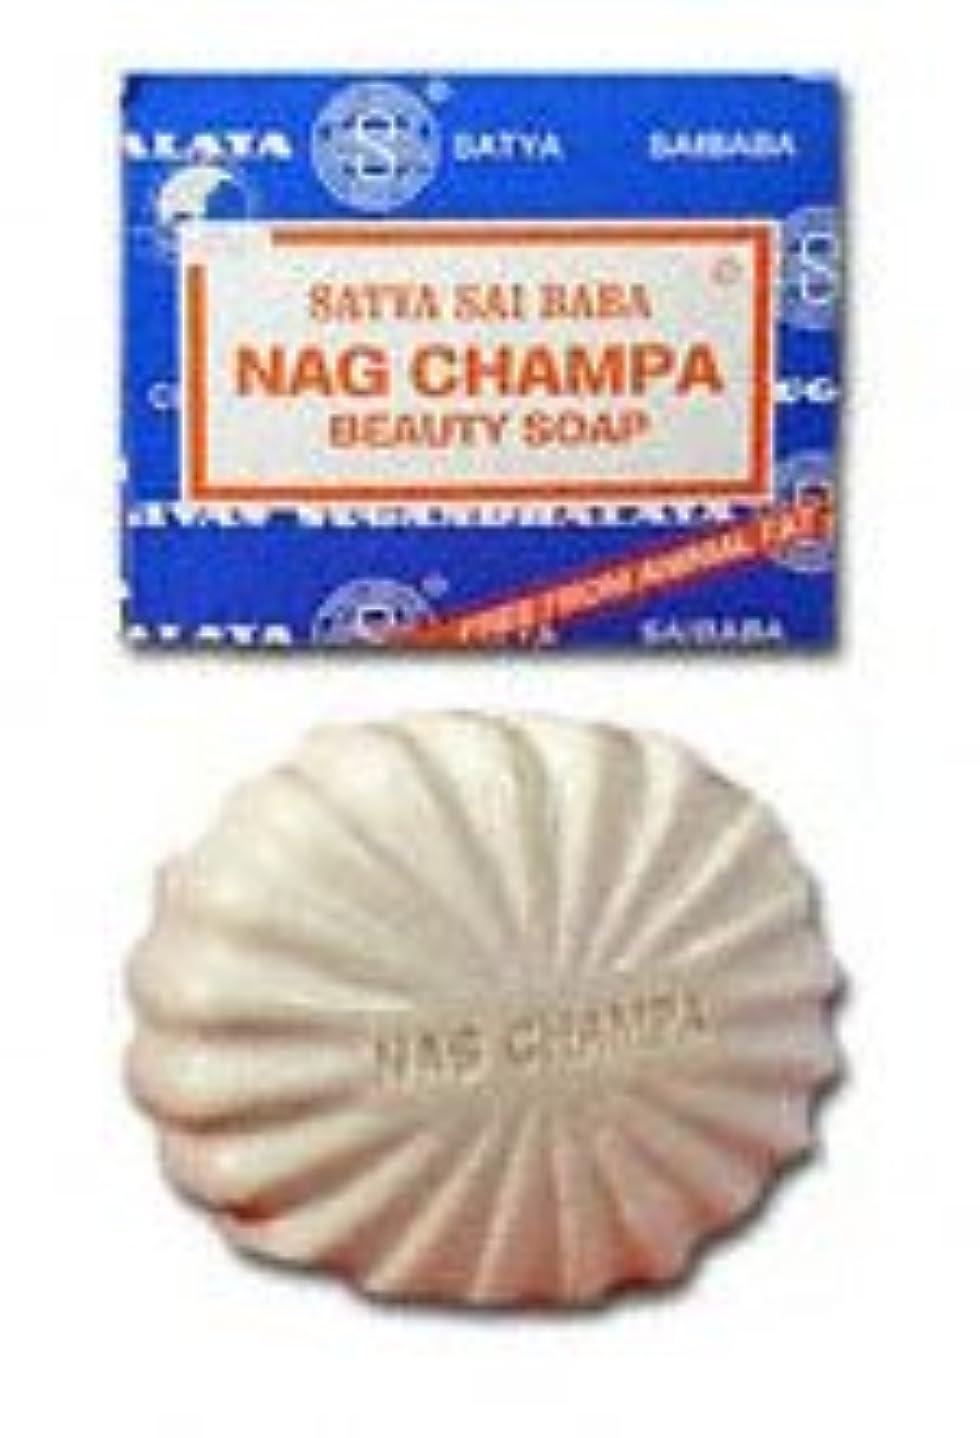 Nag Champa Beauty Soapボックス